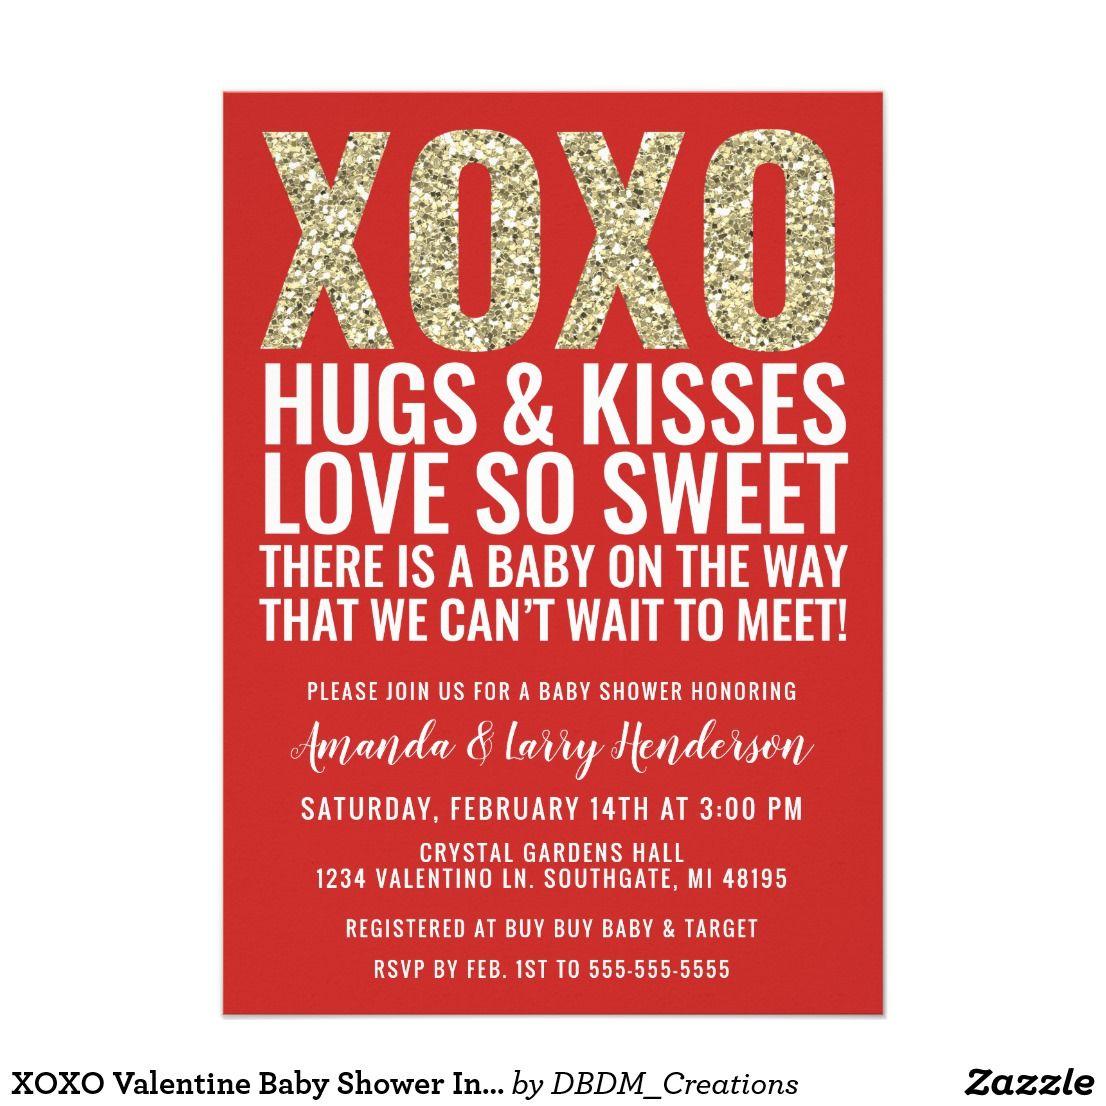 Dorable Baby Shower Invitations Zazzle Images - Invitation Card ...